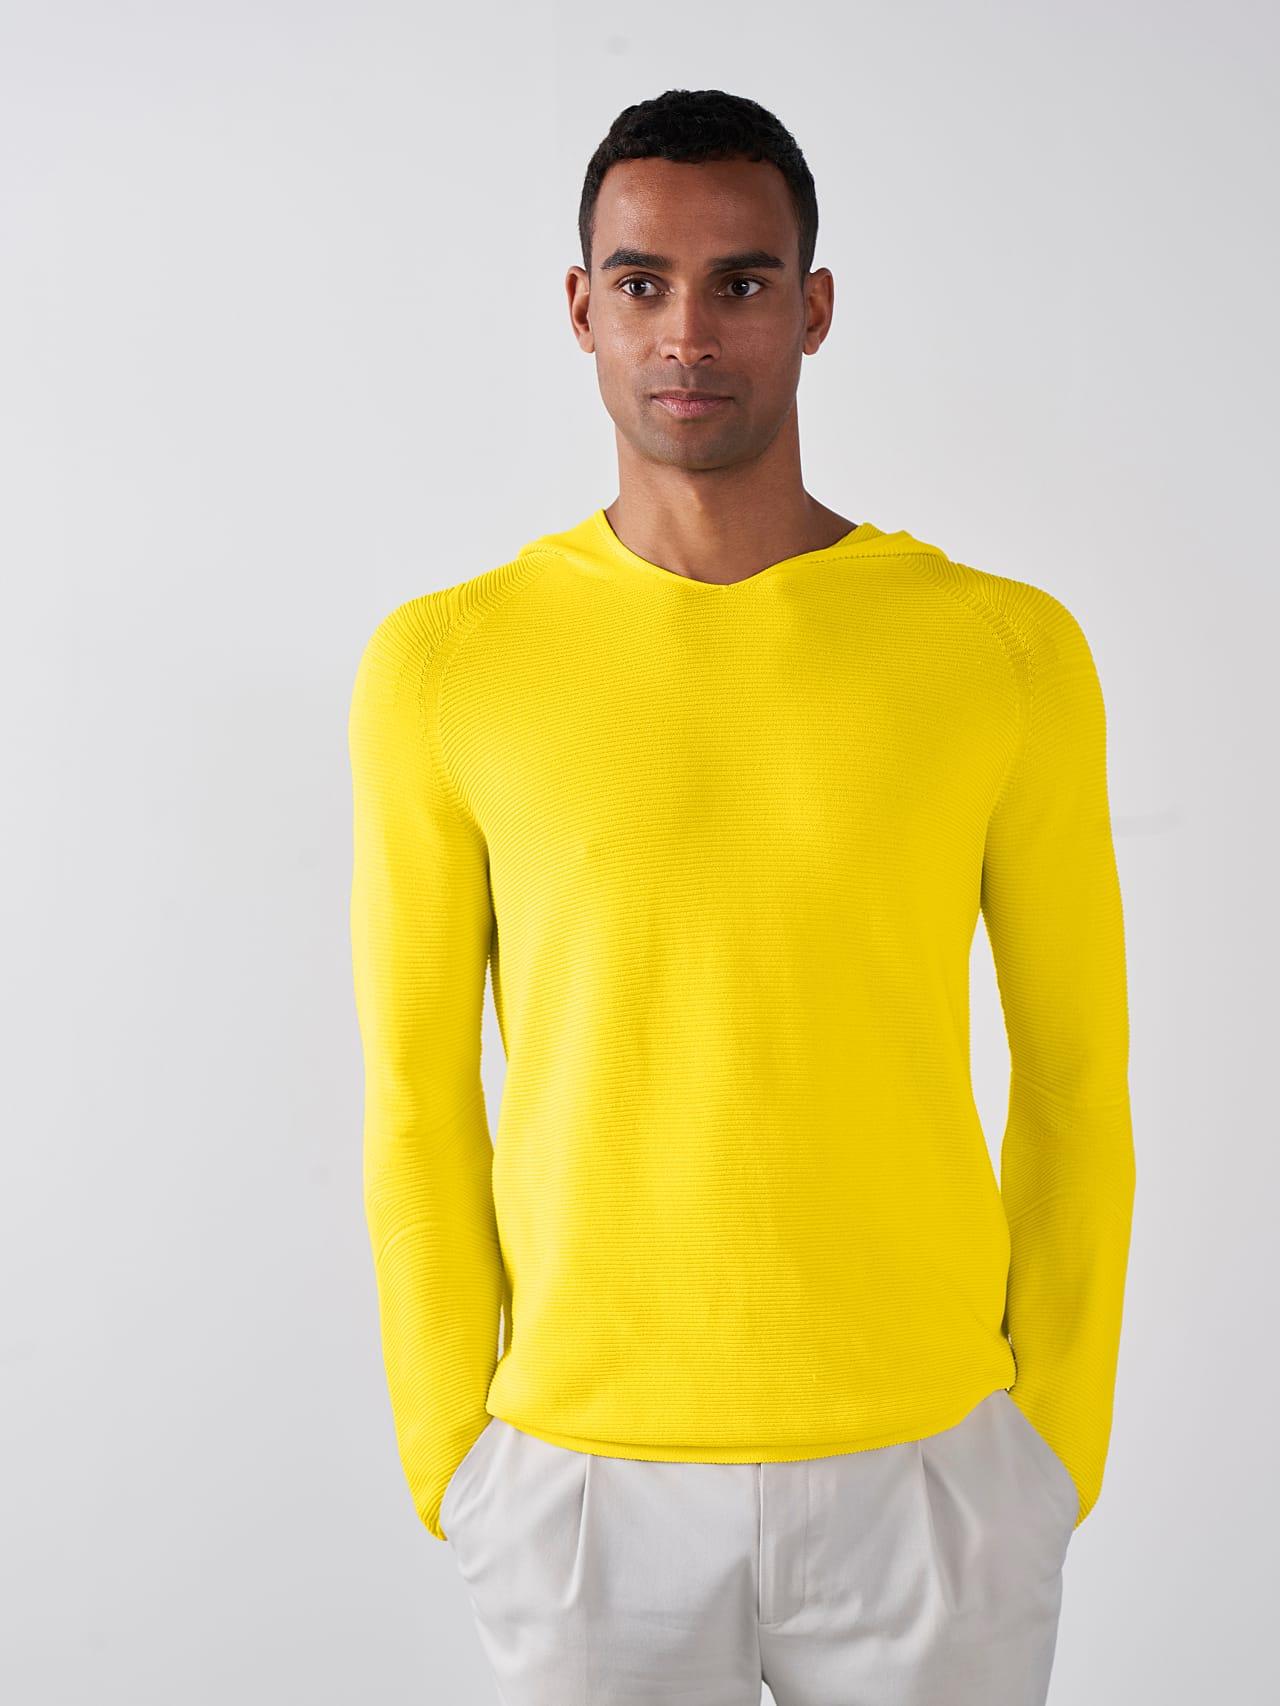 FURAP V3.Y5.01 Seamless Knit Hoodie yellow Front Main Alpha Tauri